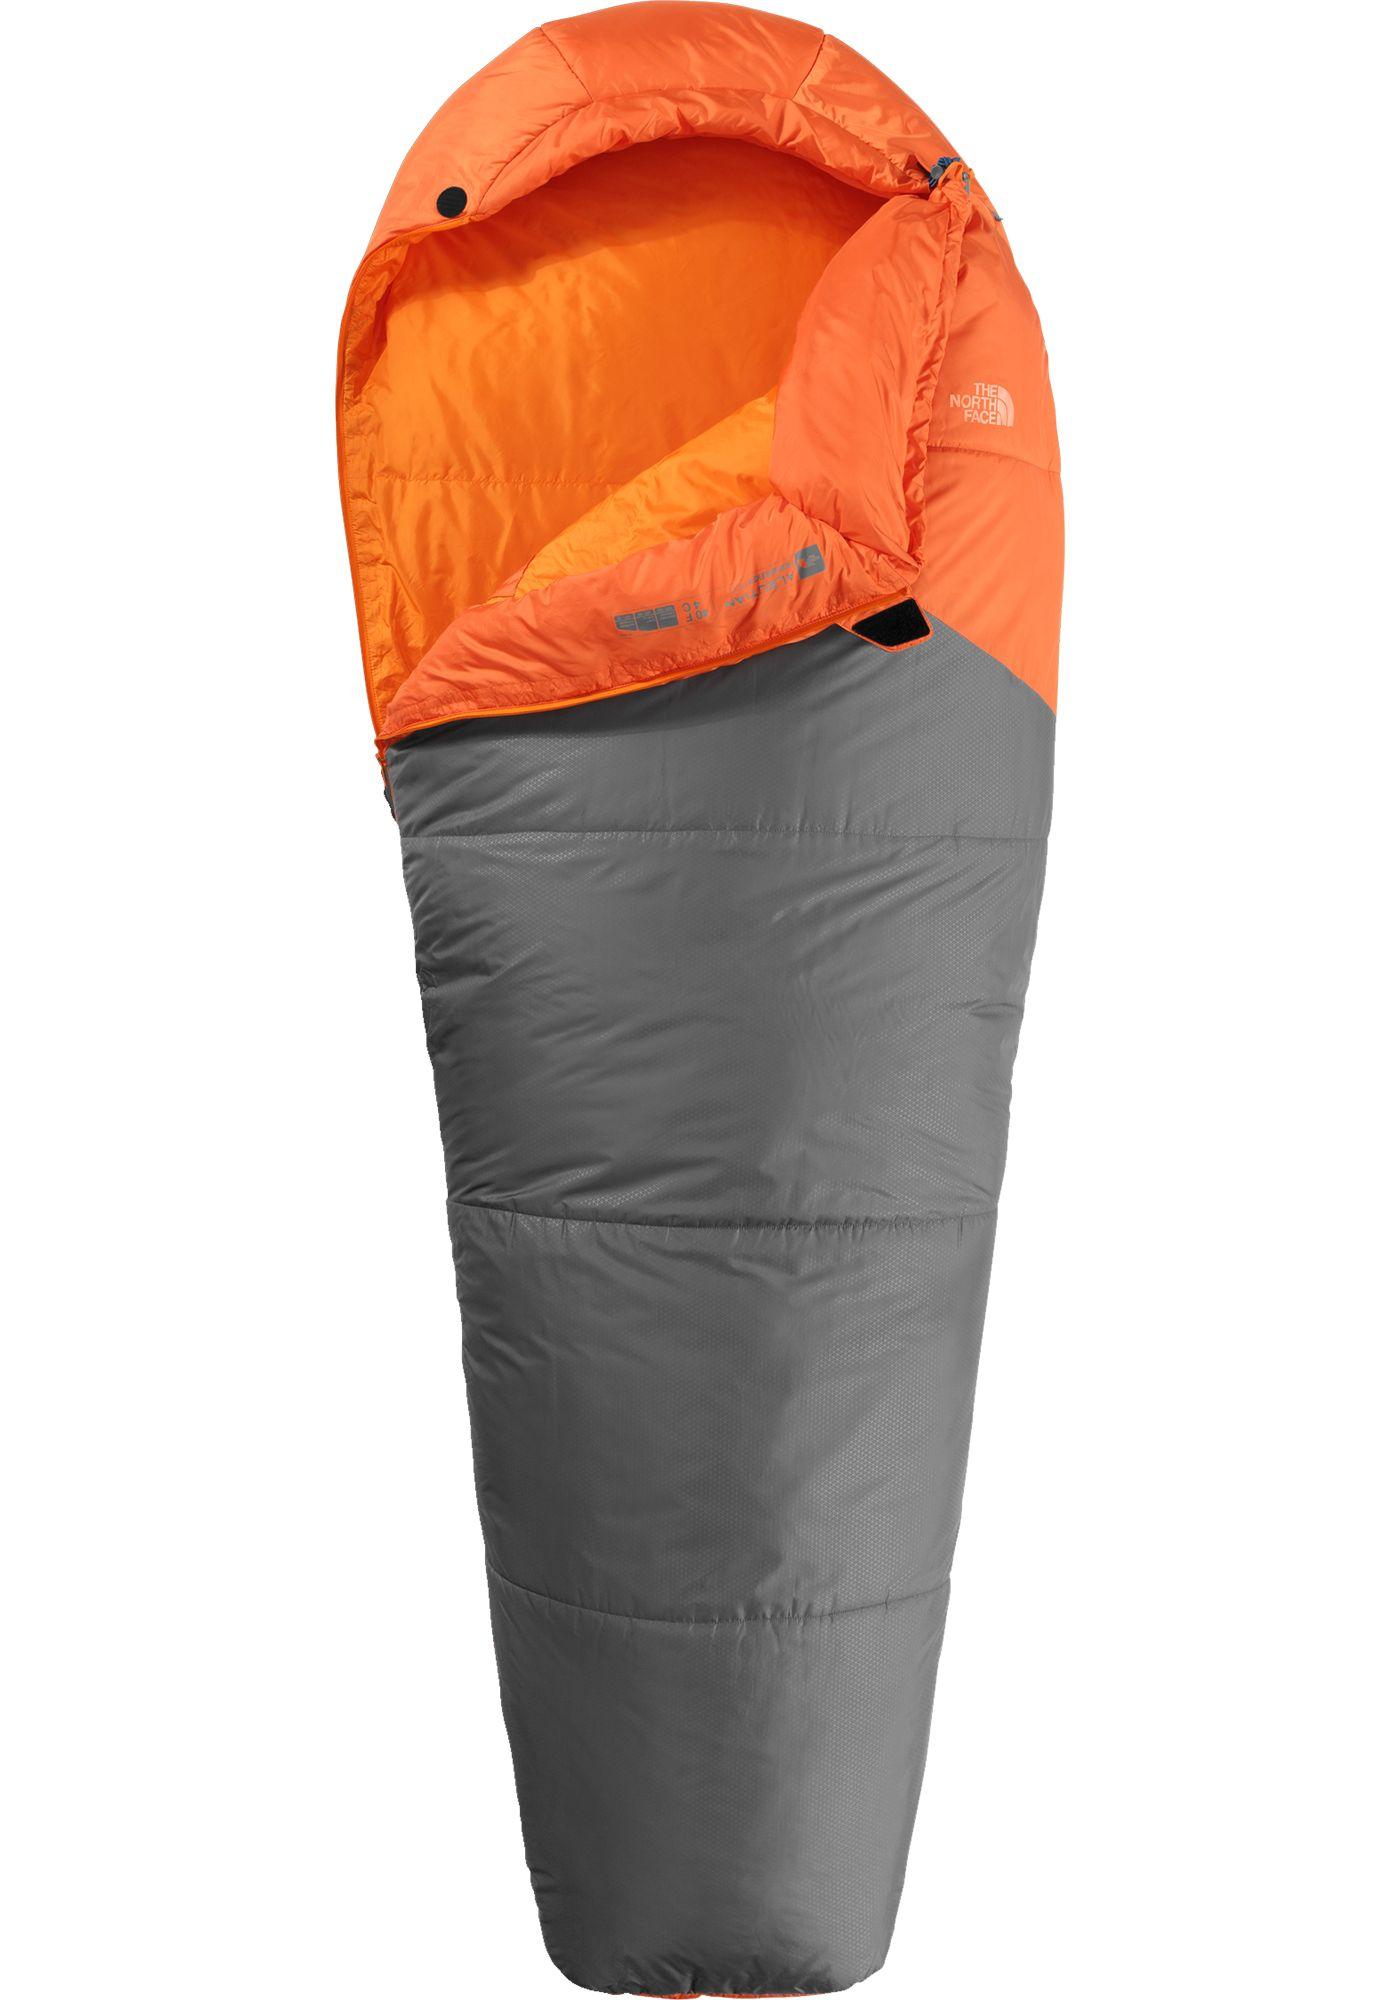 The North Face Aleutian 40° Sleeping Bag